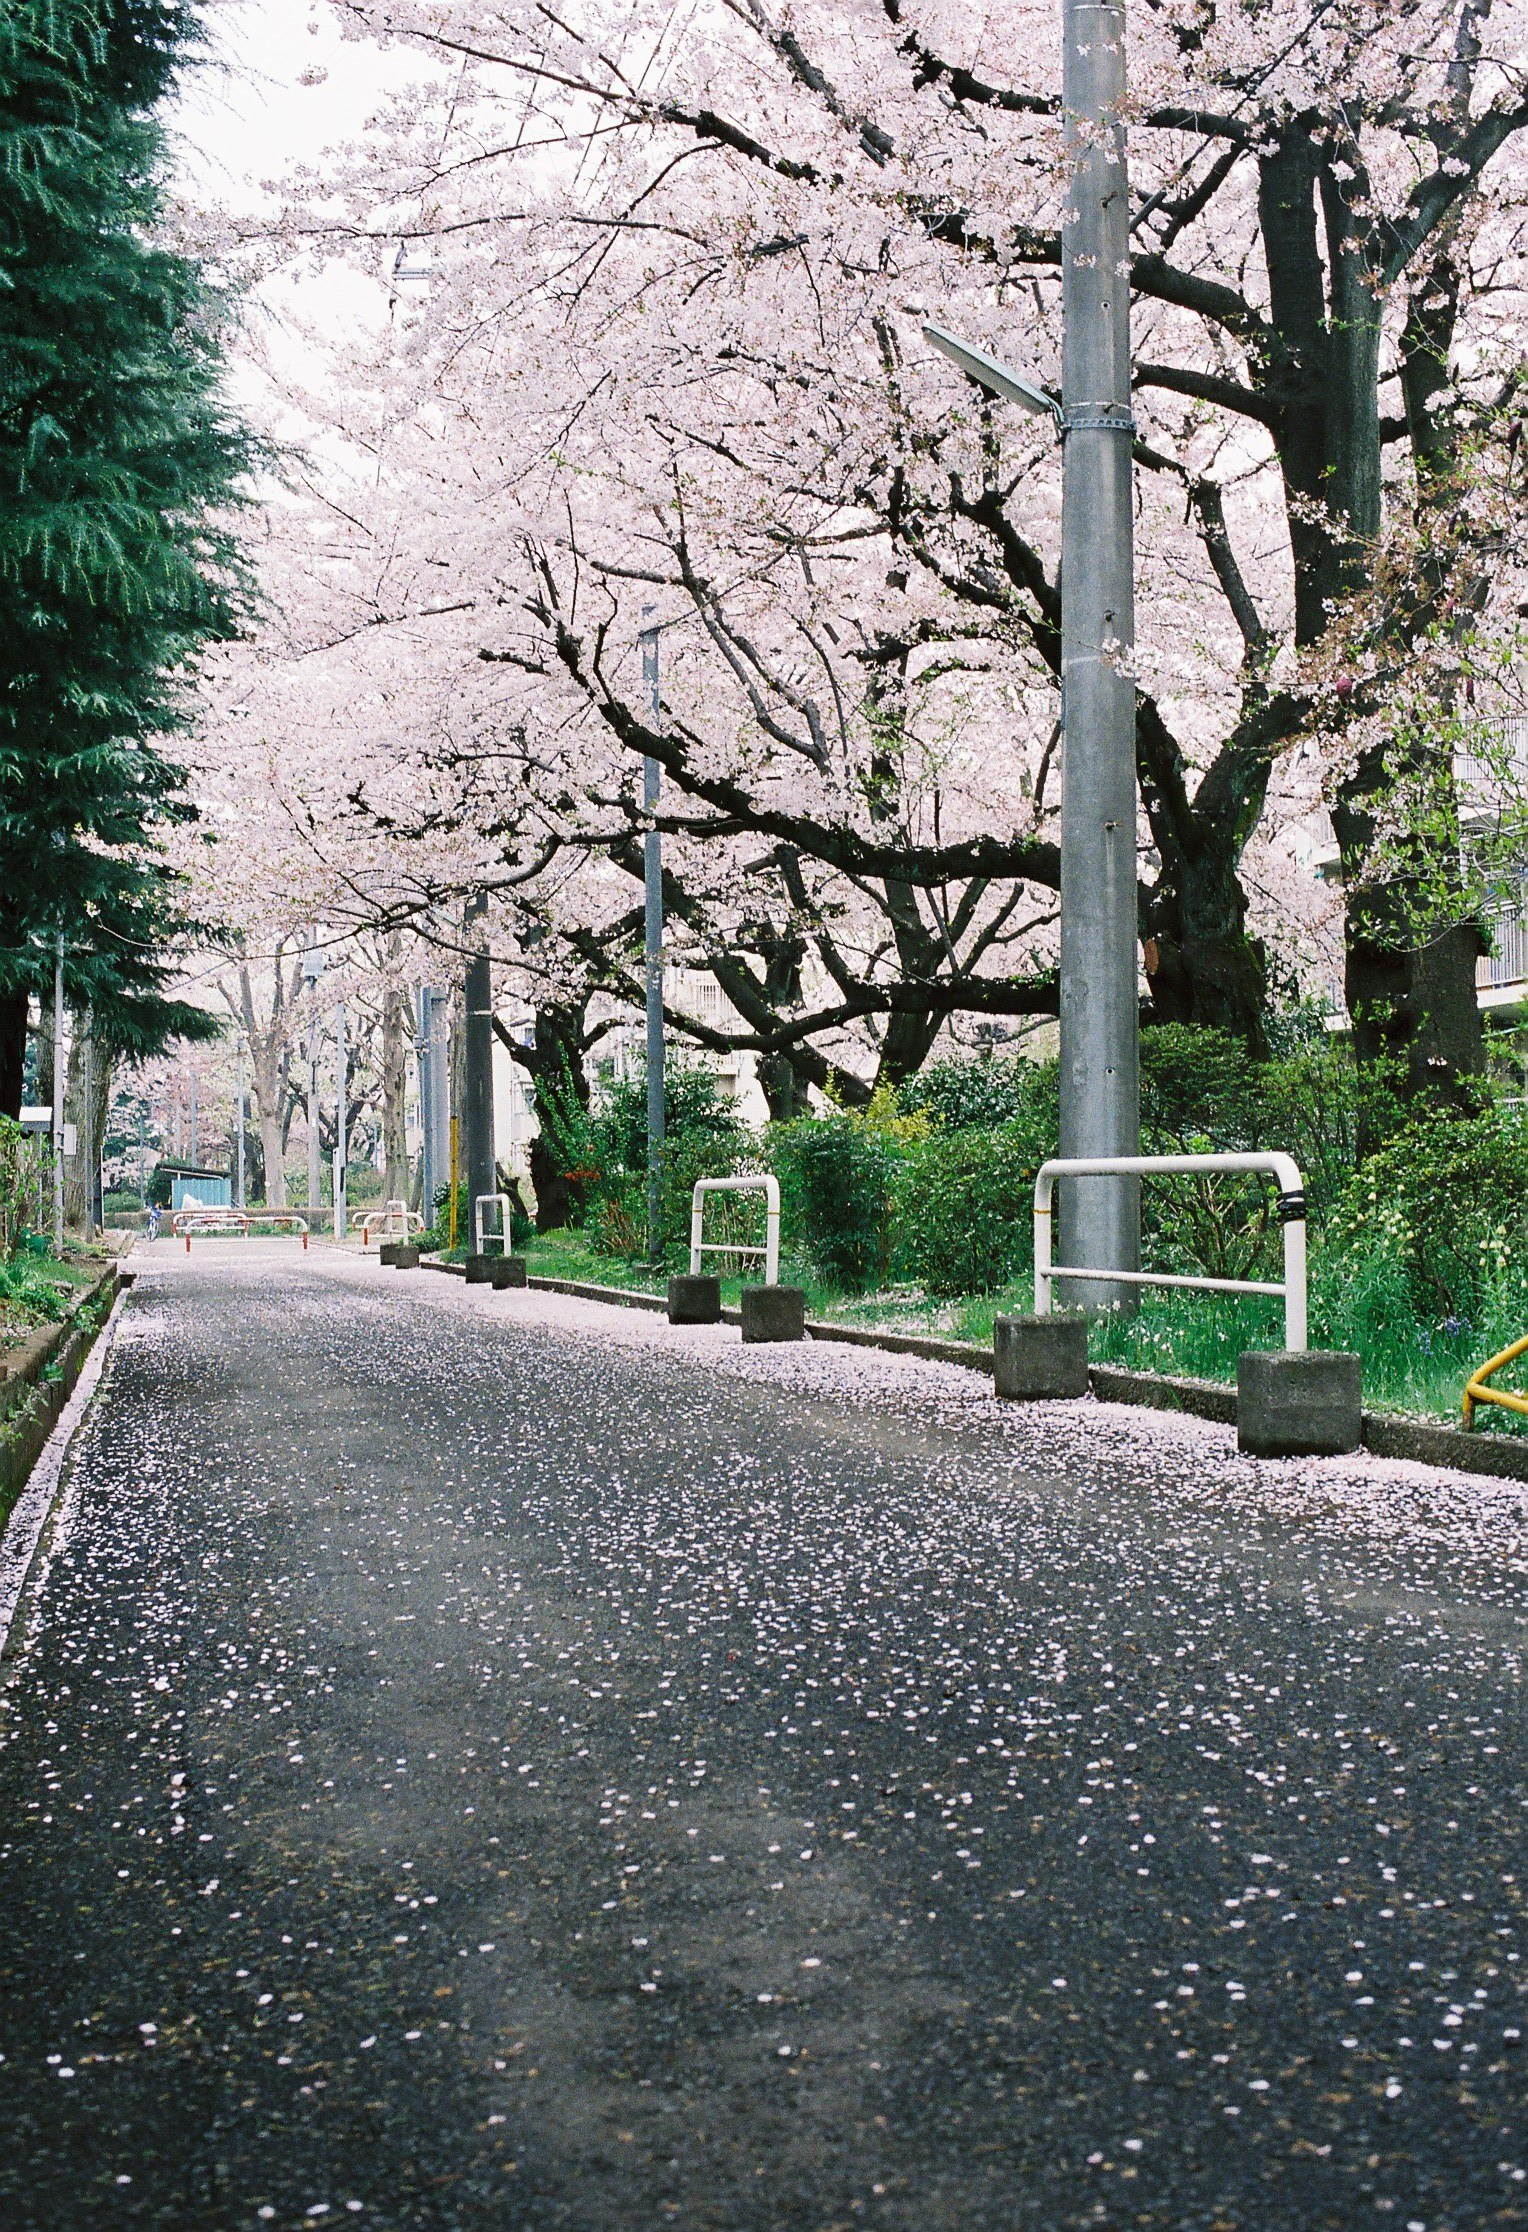 Sakura på vejen